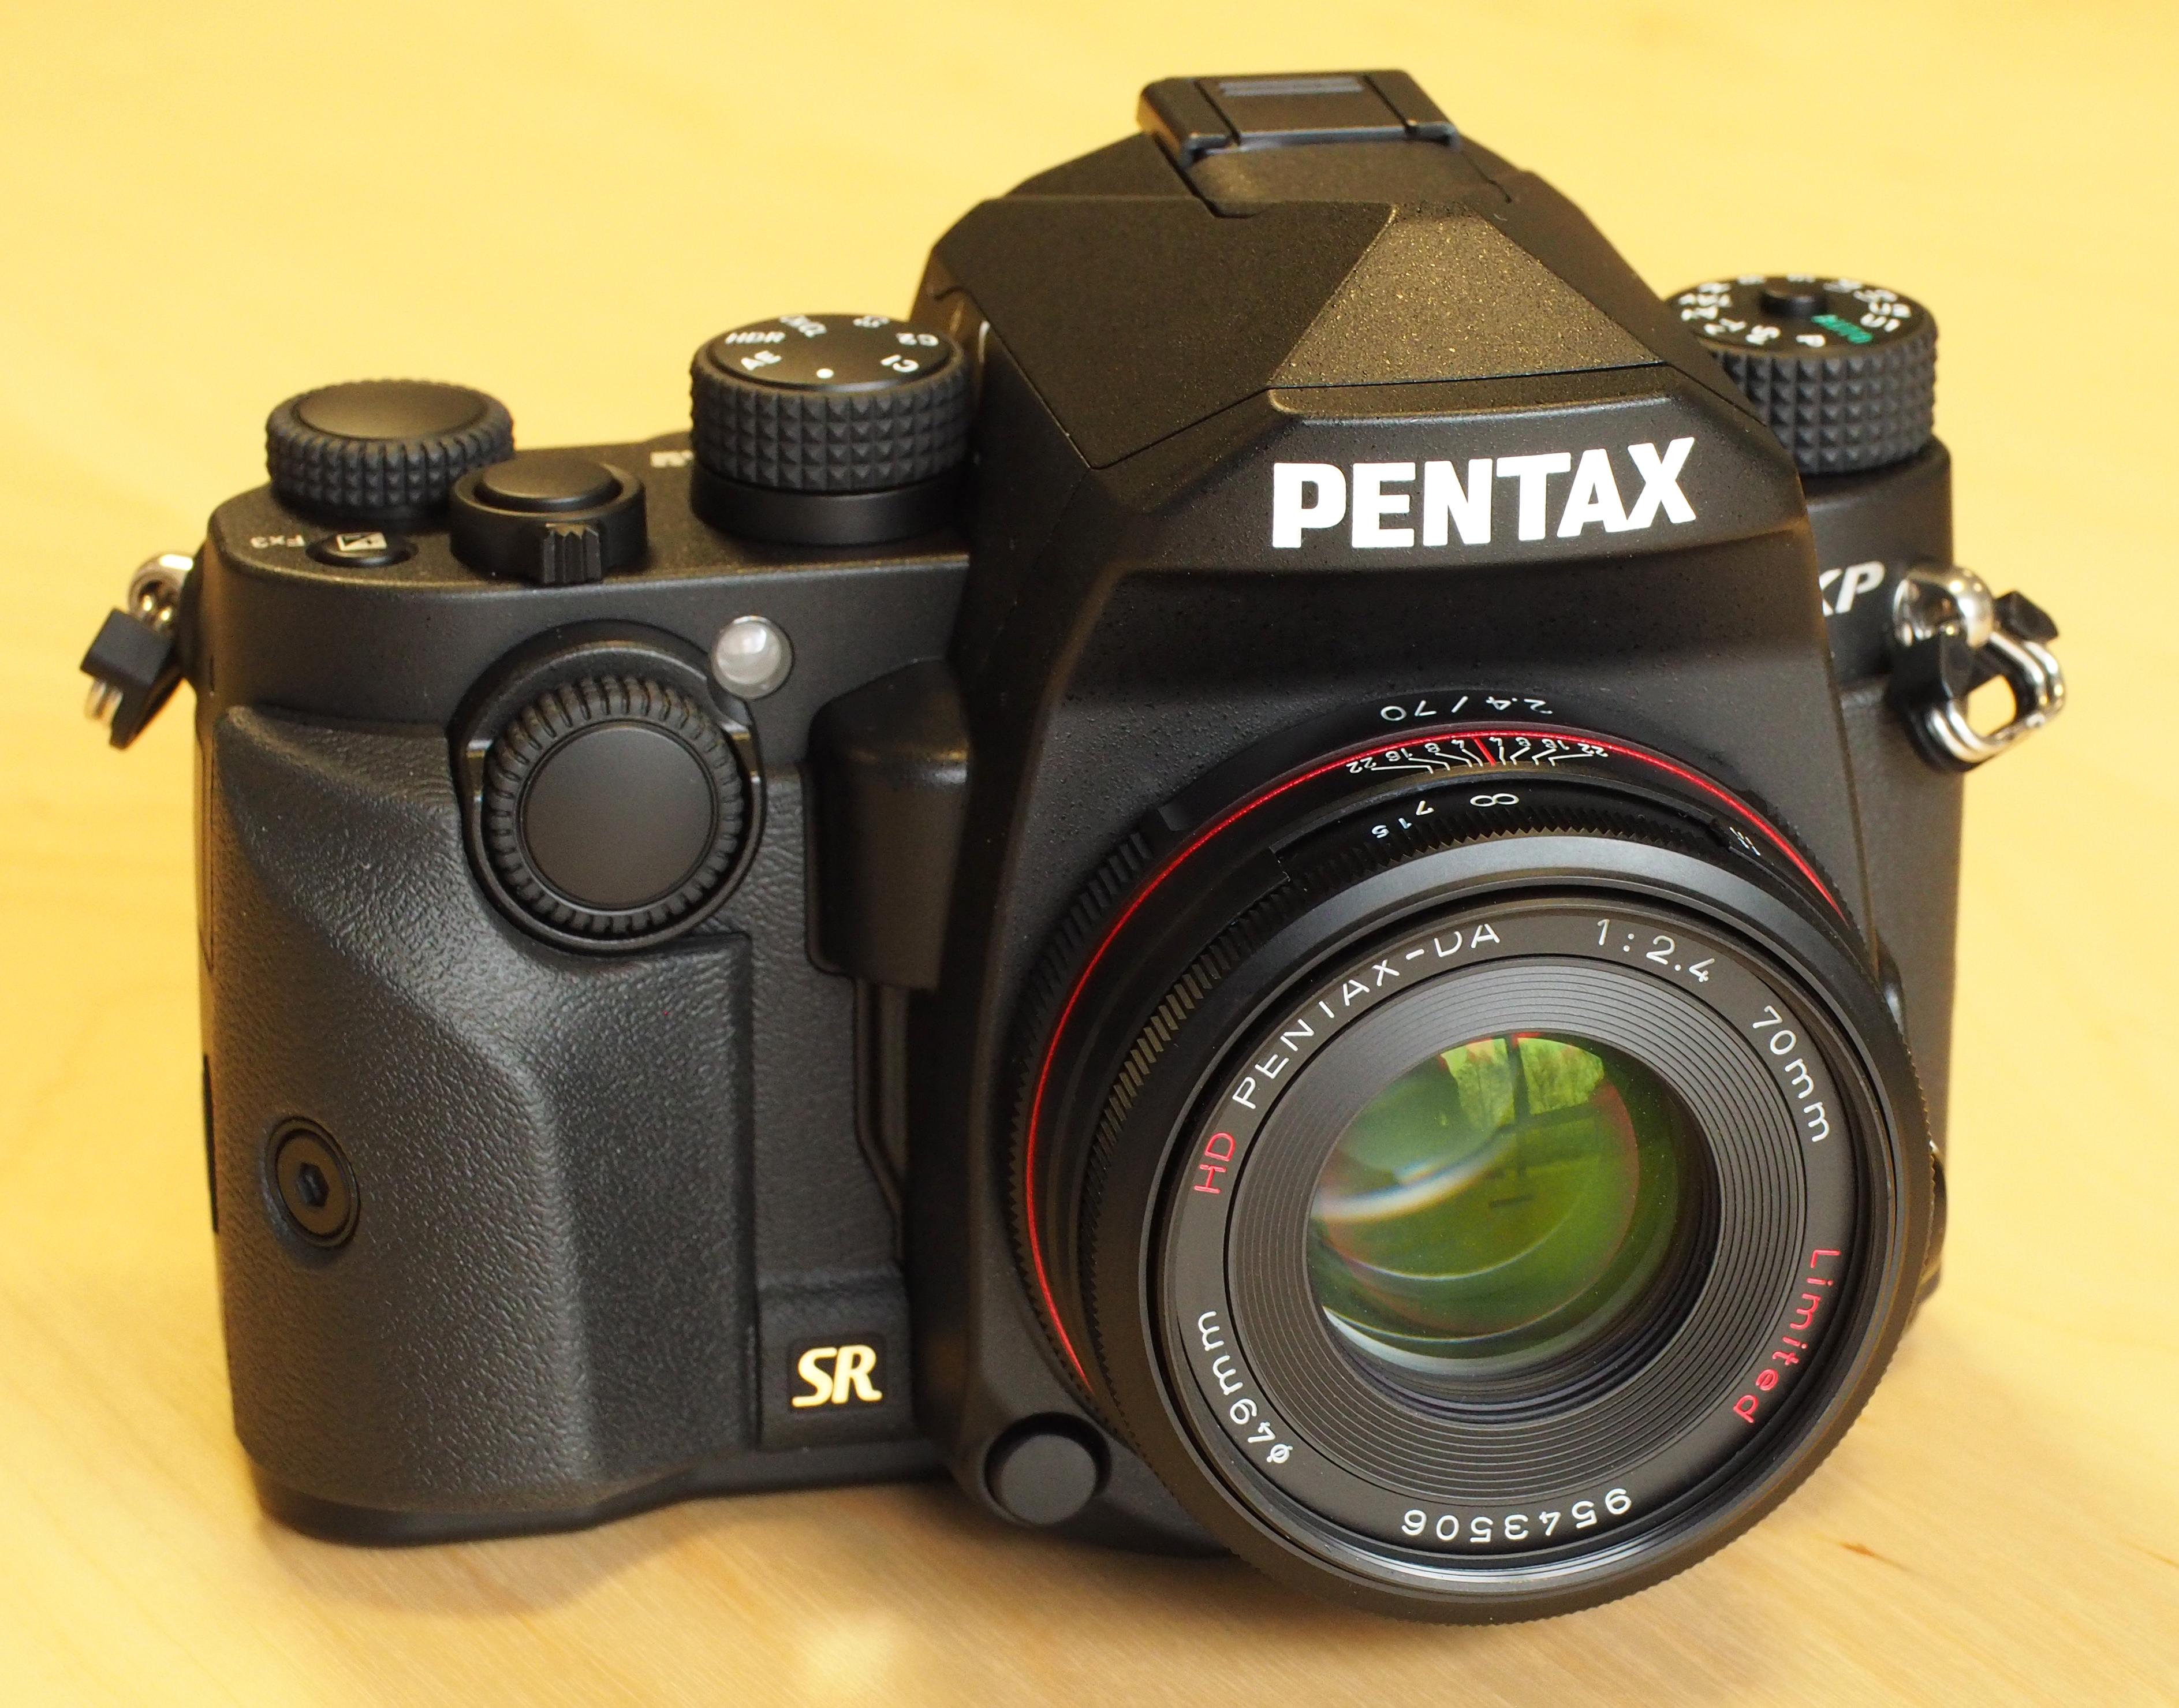 pentax kp review rh ephotozine com Pentax K X Review Pentax K X Manual